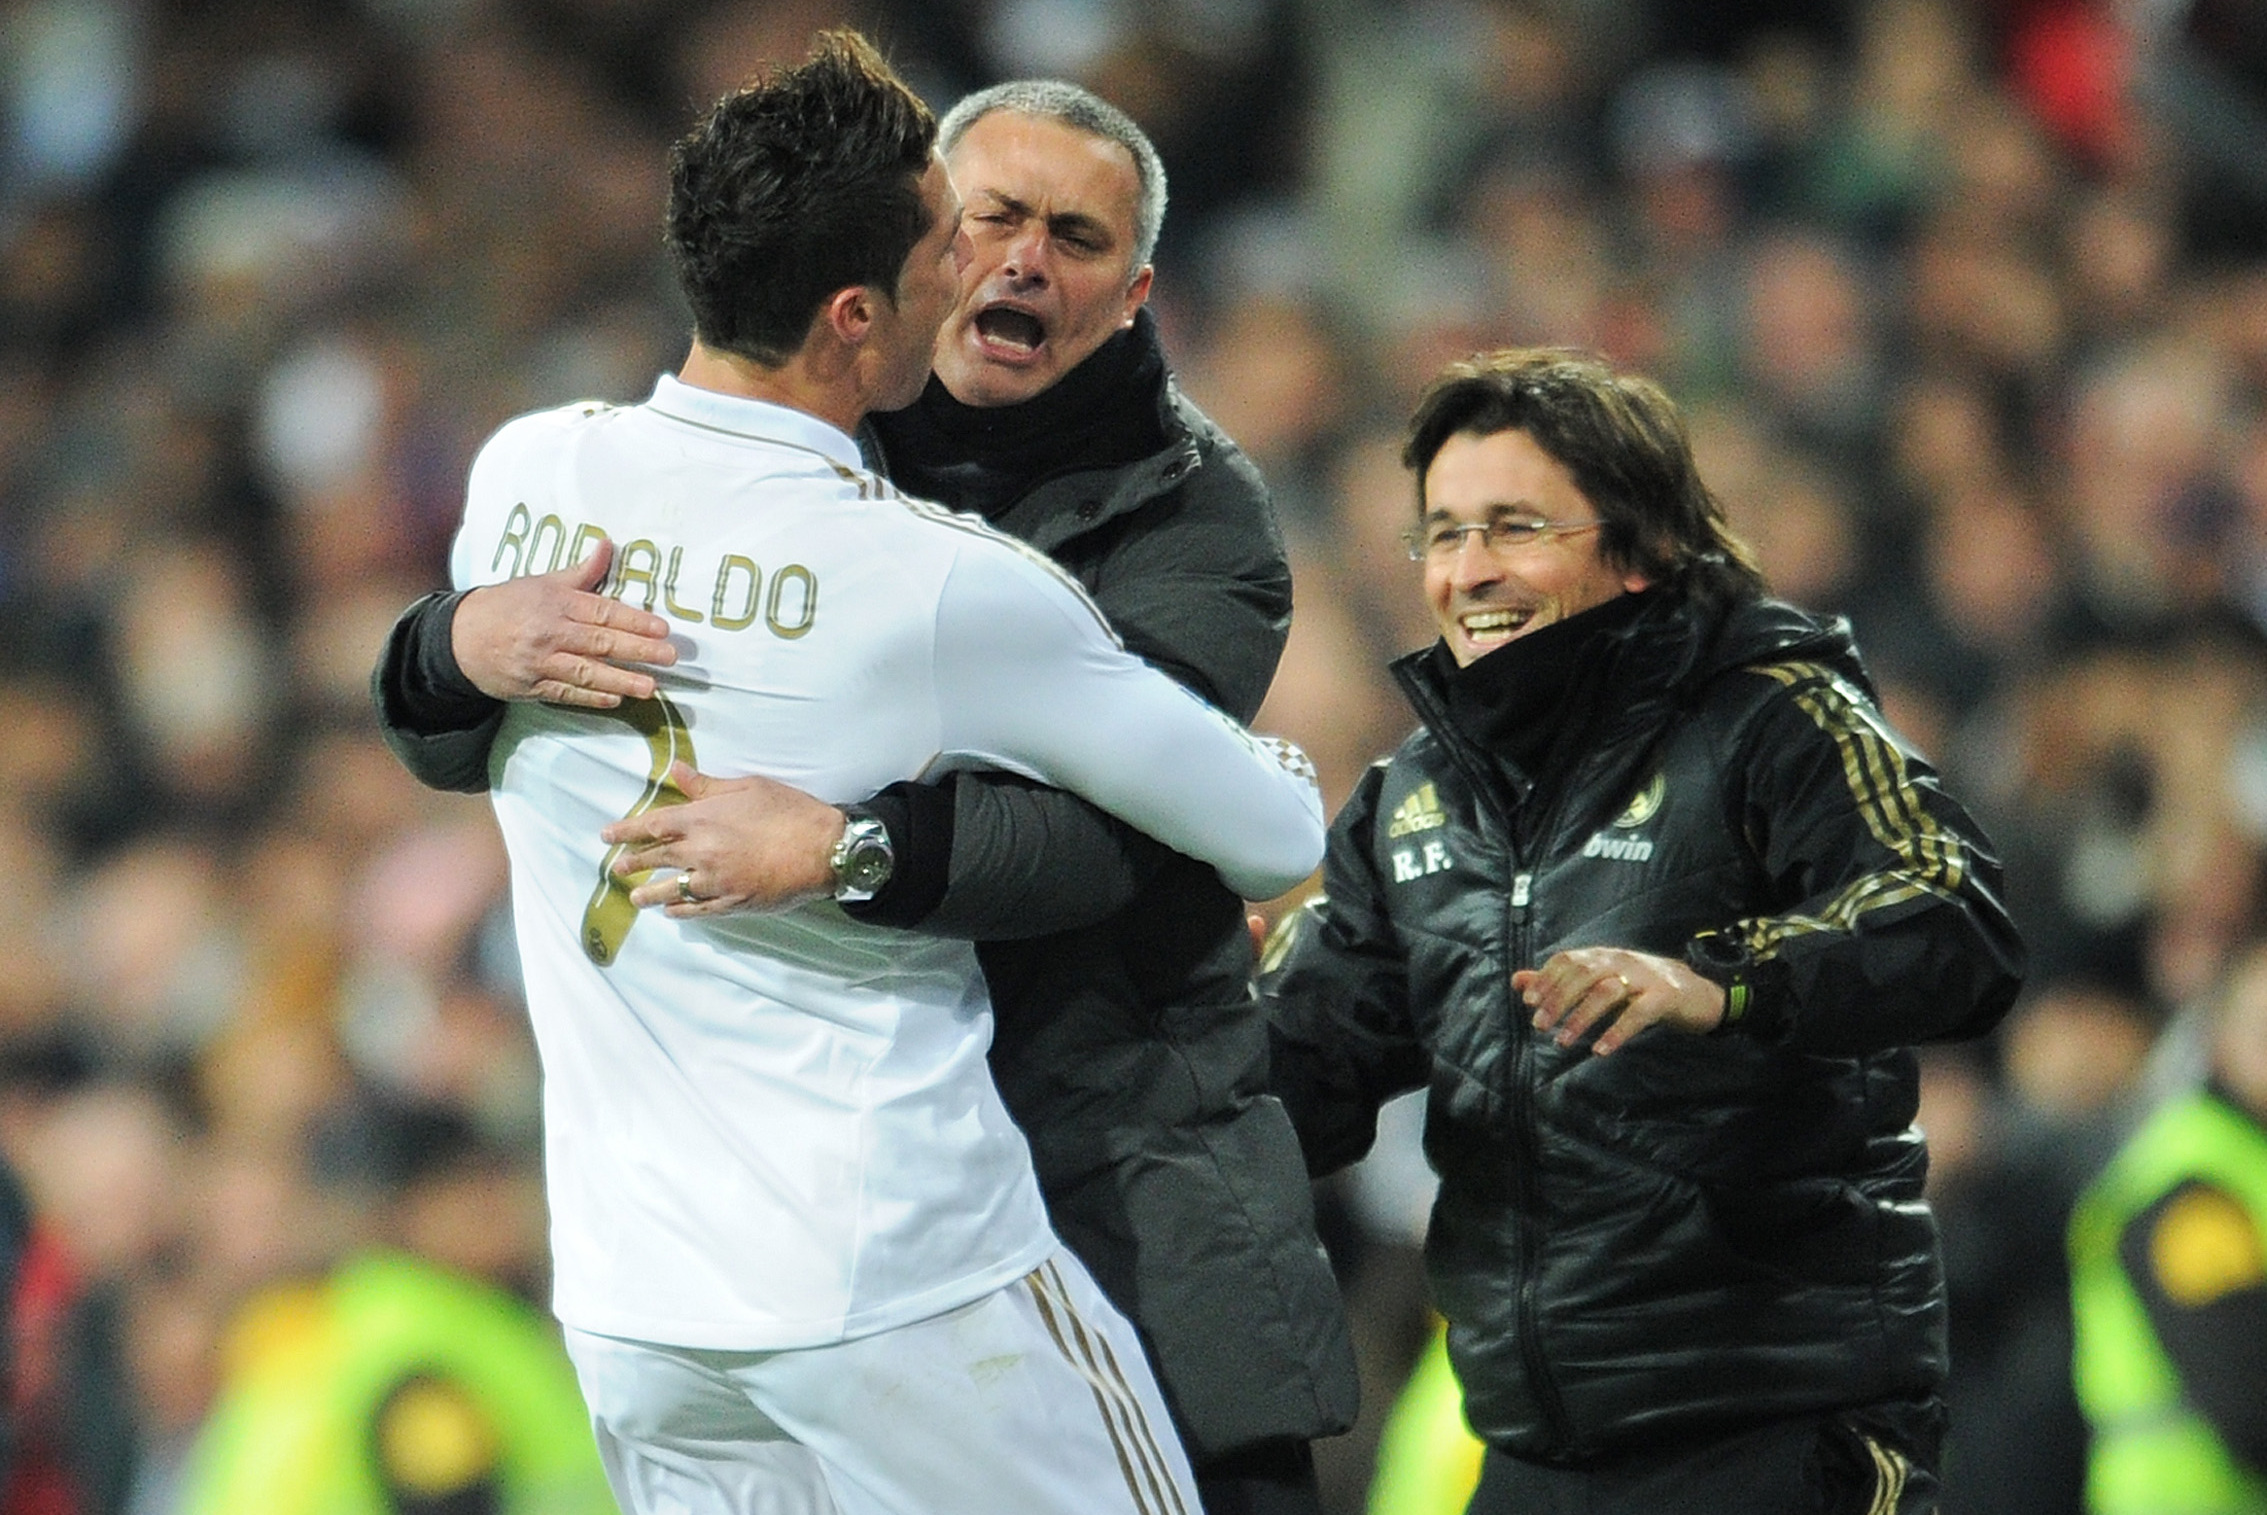 Premier League: Cristiano Ronaldo's ex-boss Jose Mourinho makes bold statement on his return, calls it  'perfect business'